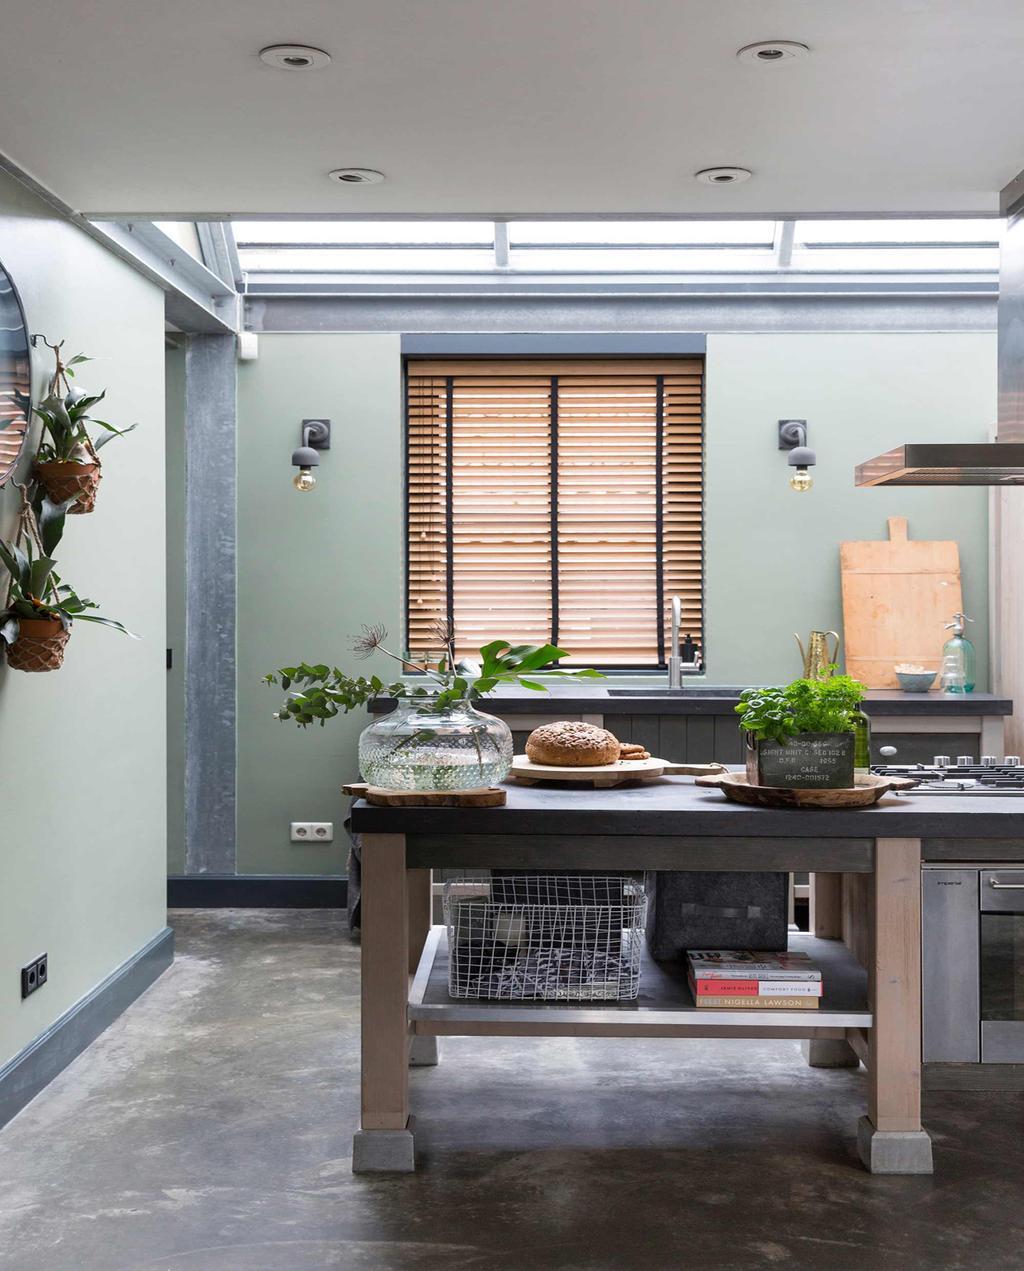 vtwonen 10-2017 | groene keuken met houten werkbank